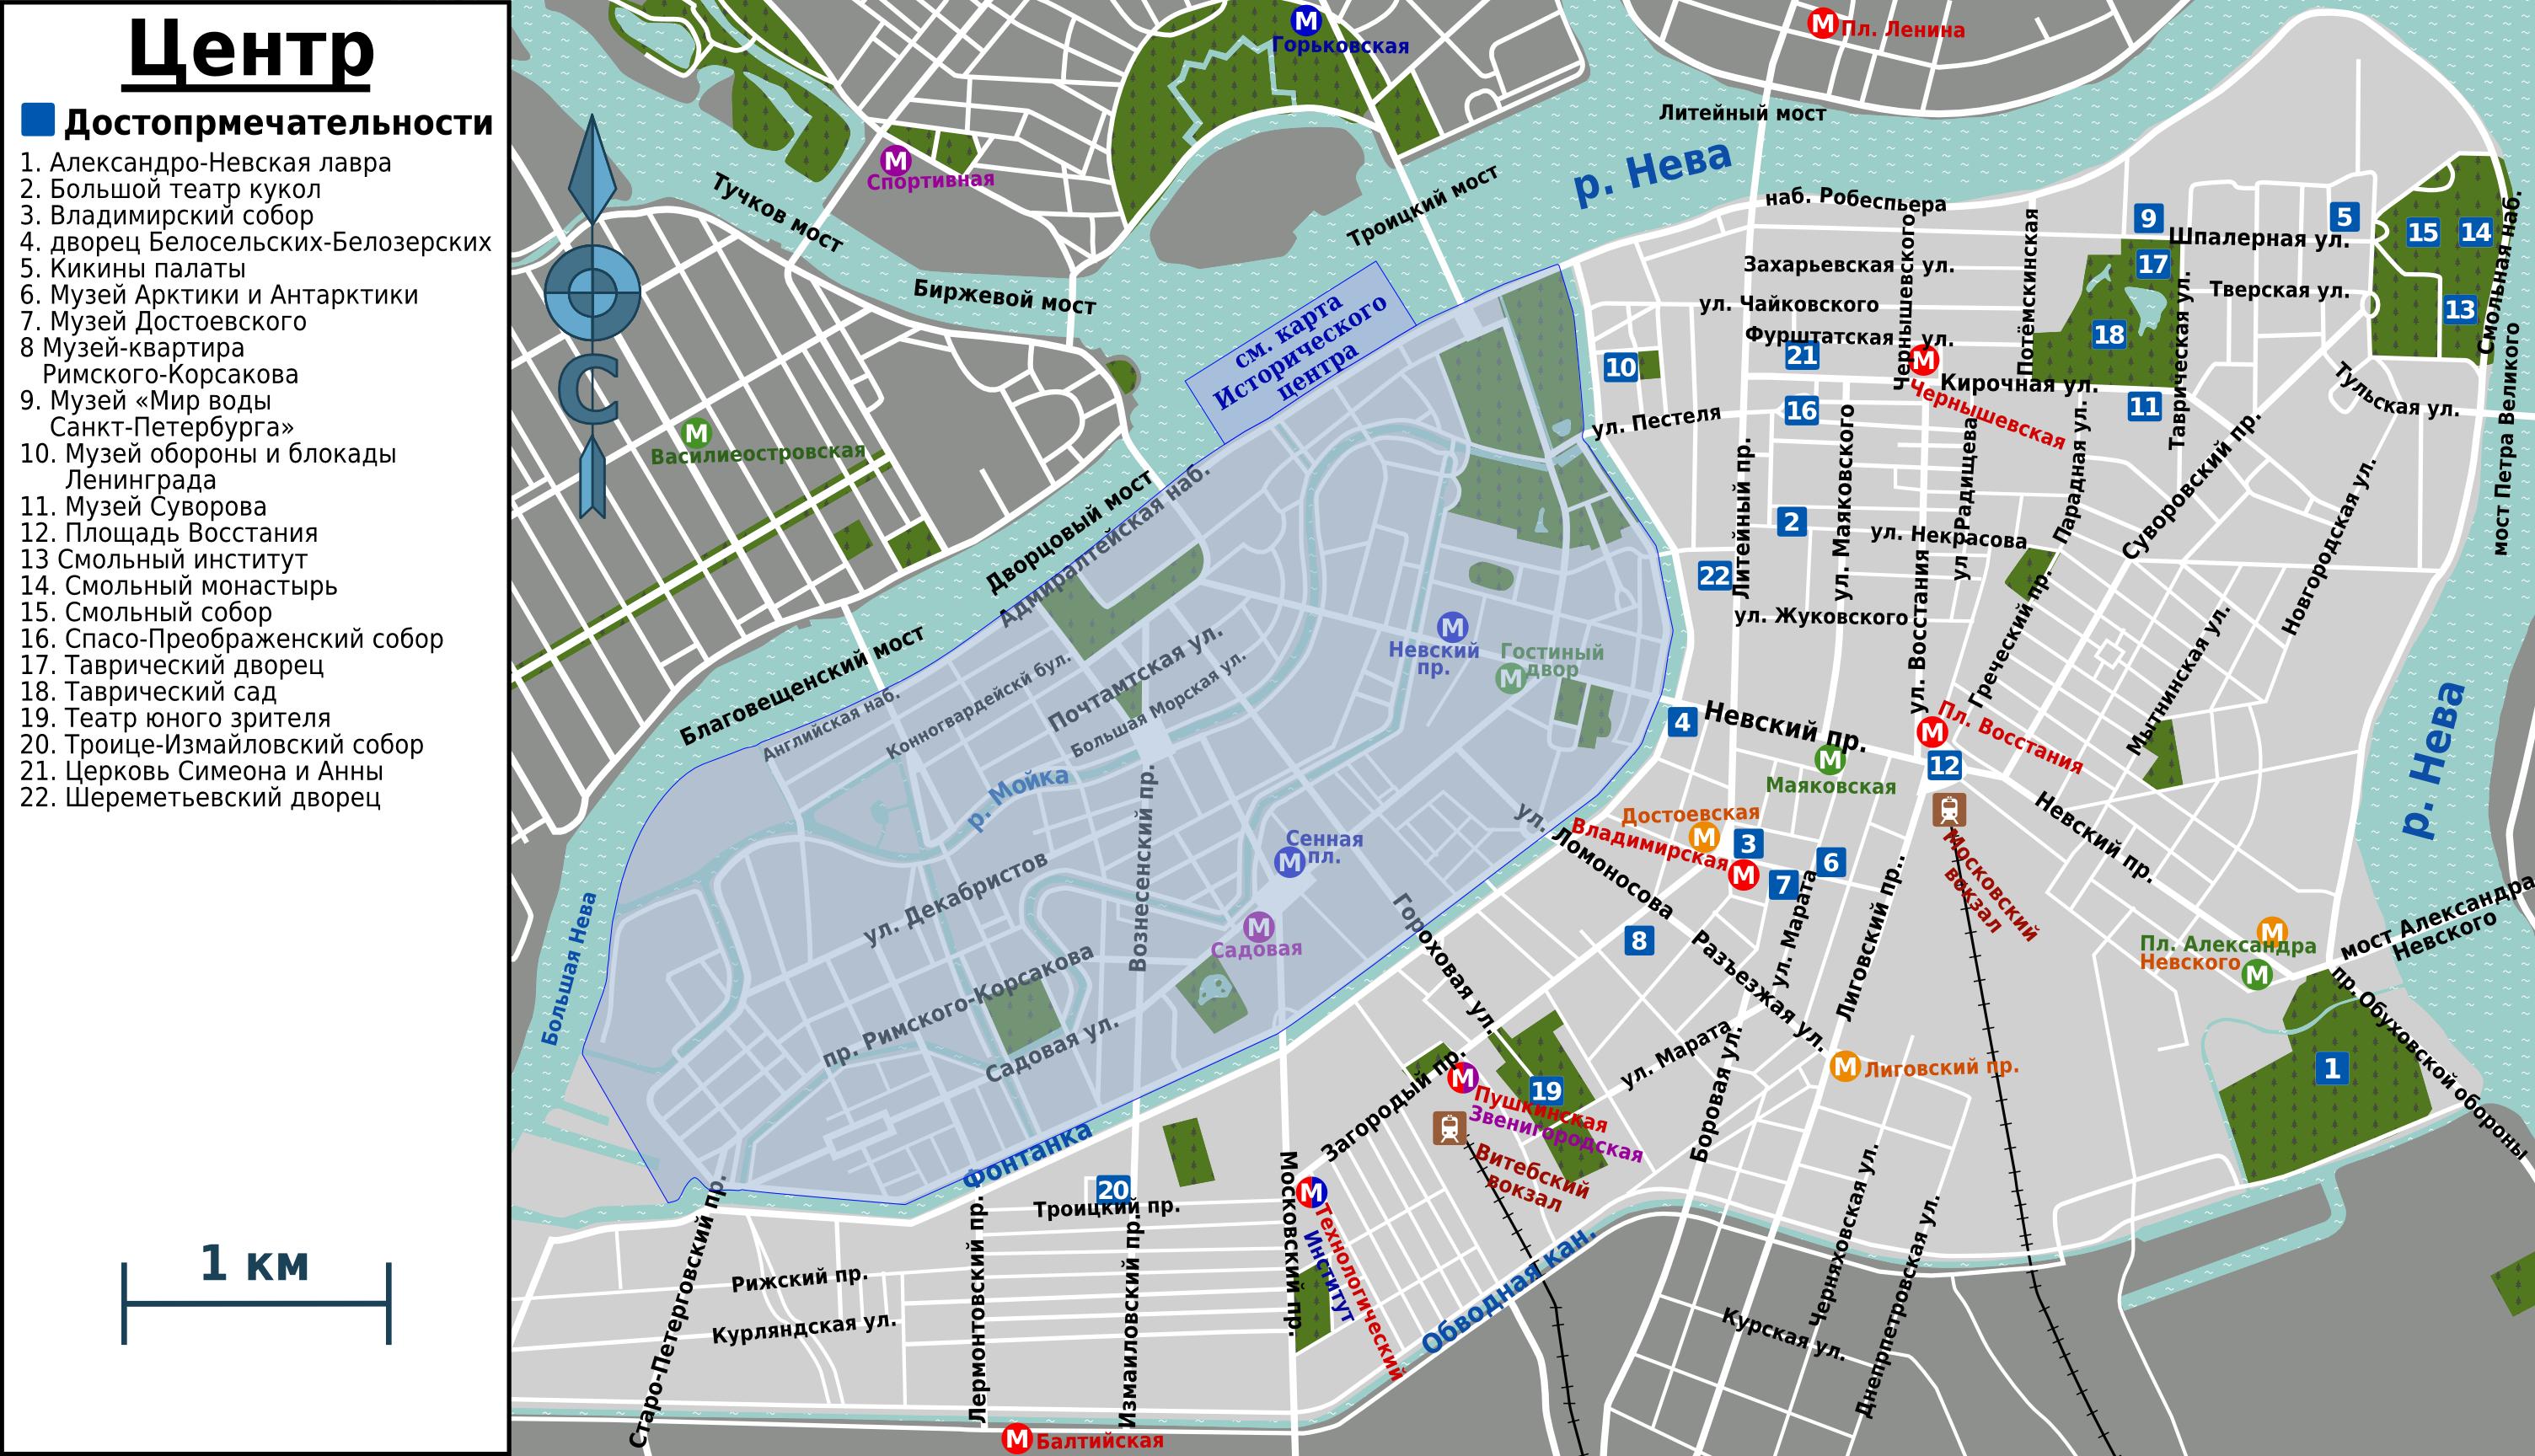 мини-отель антверпен спб карта